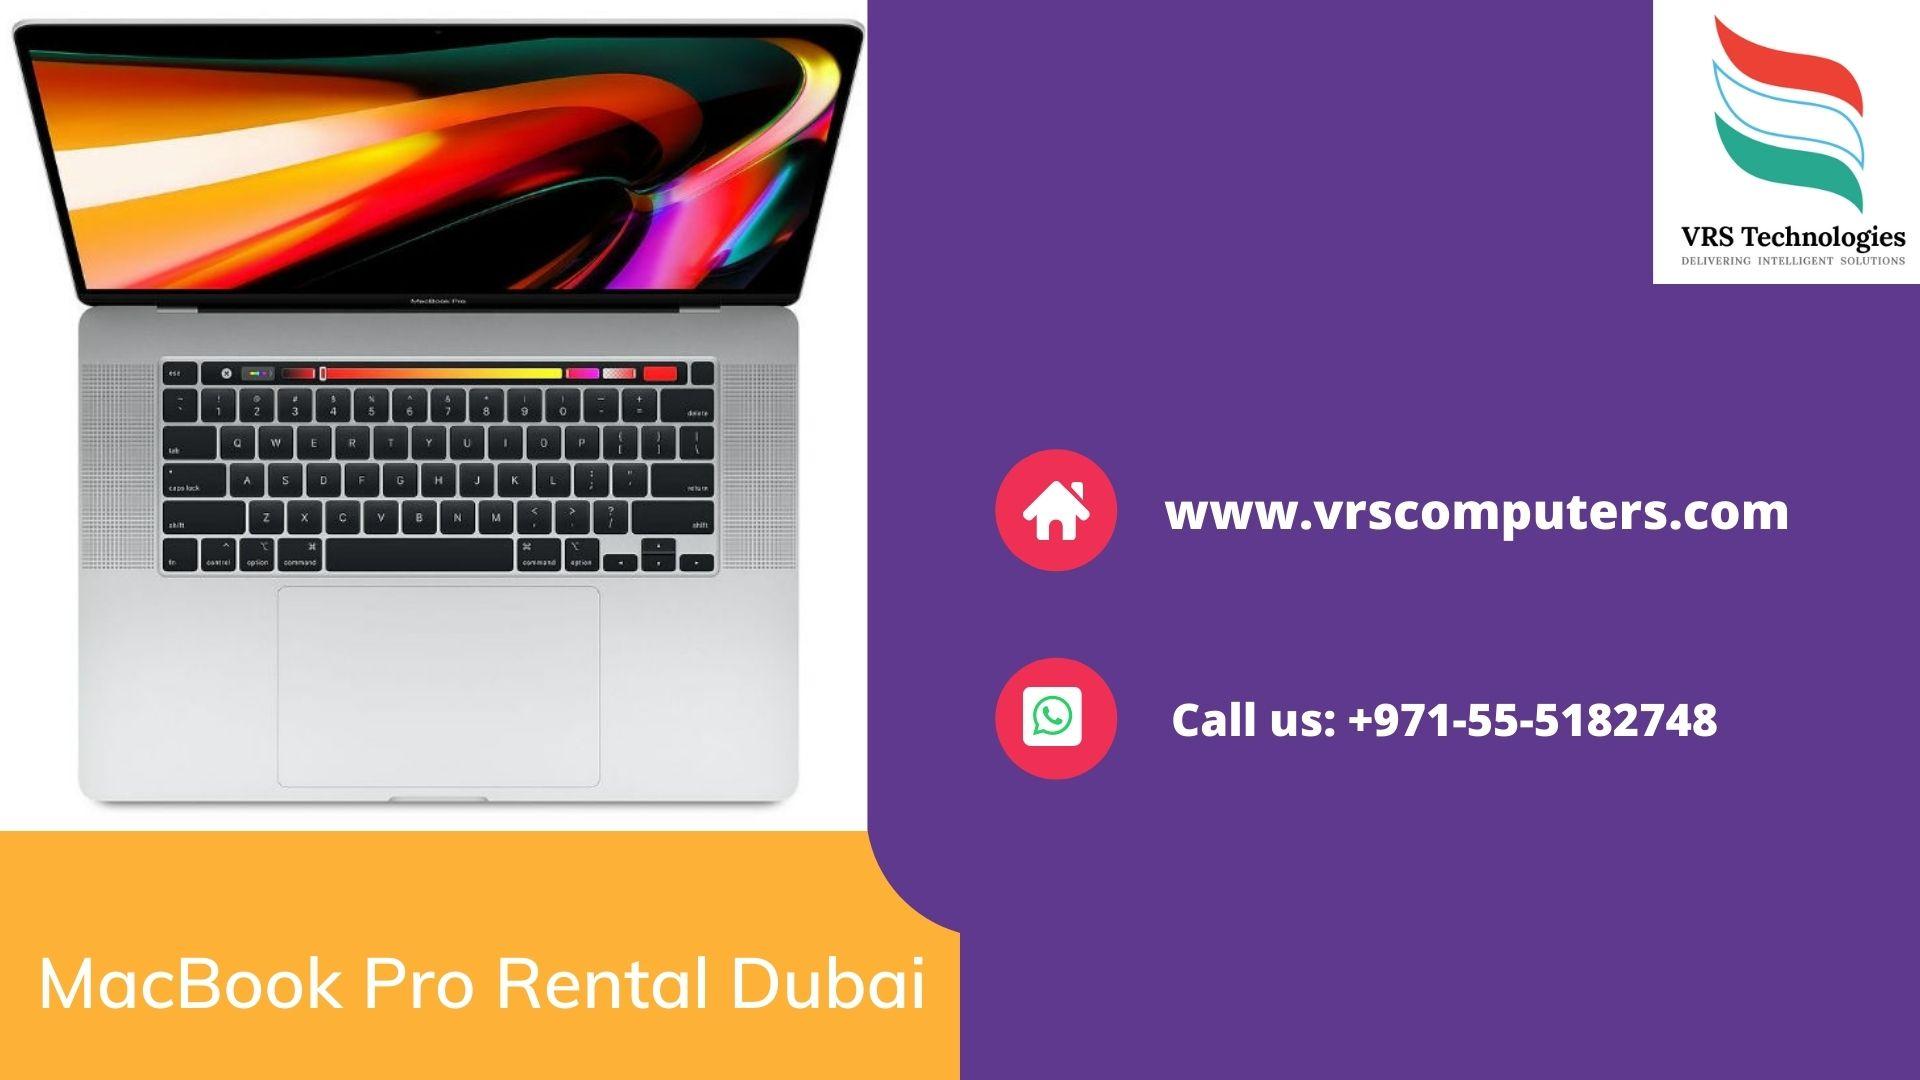 MacBook-Pro-Rental-Dubai.jpg